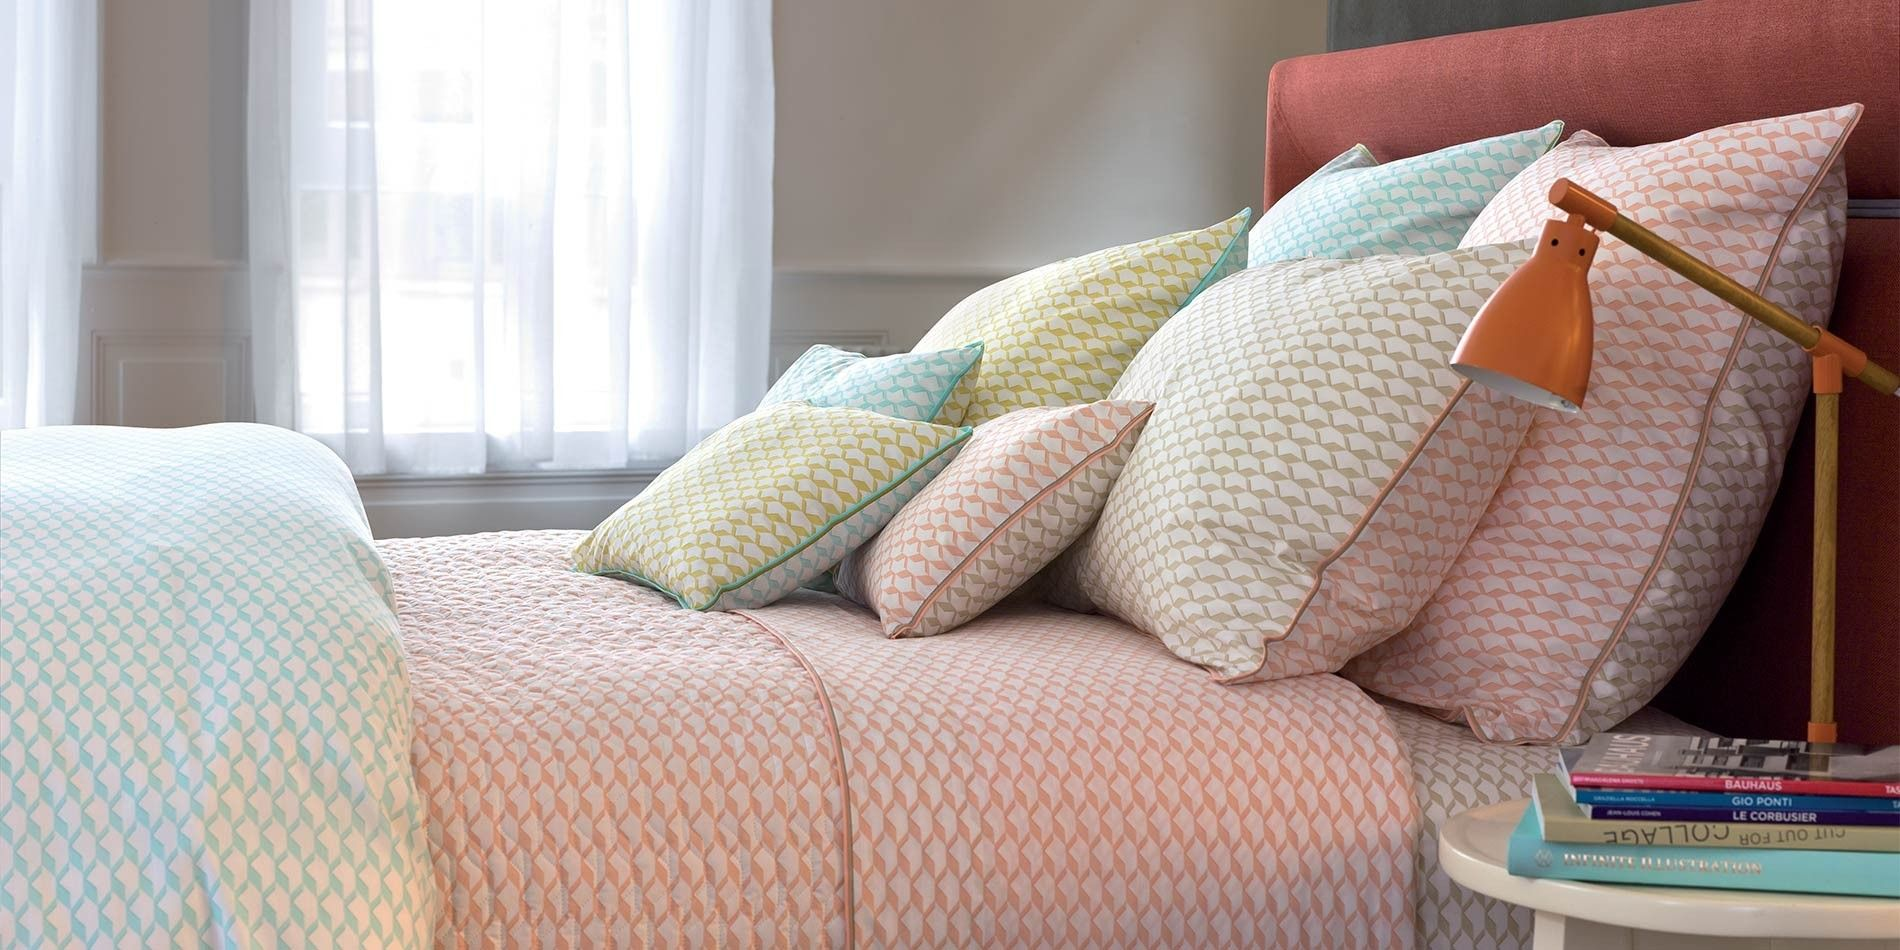 Voguer Bedding Printed Linens Yves Delorme Bed